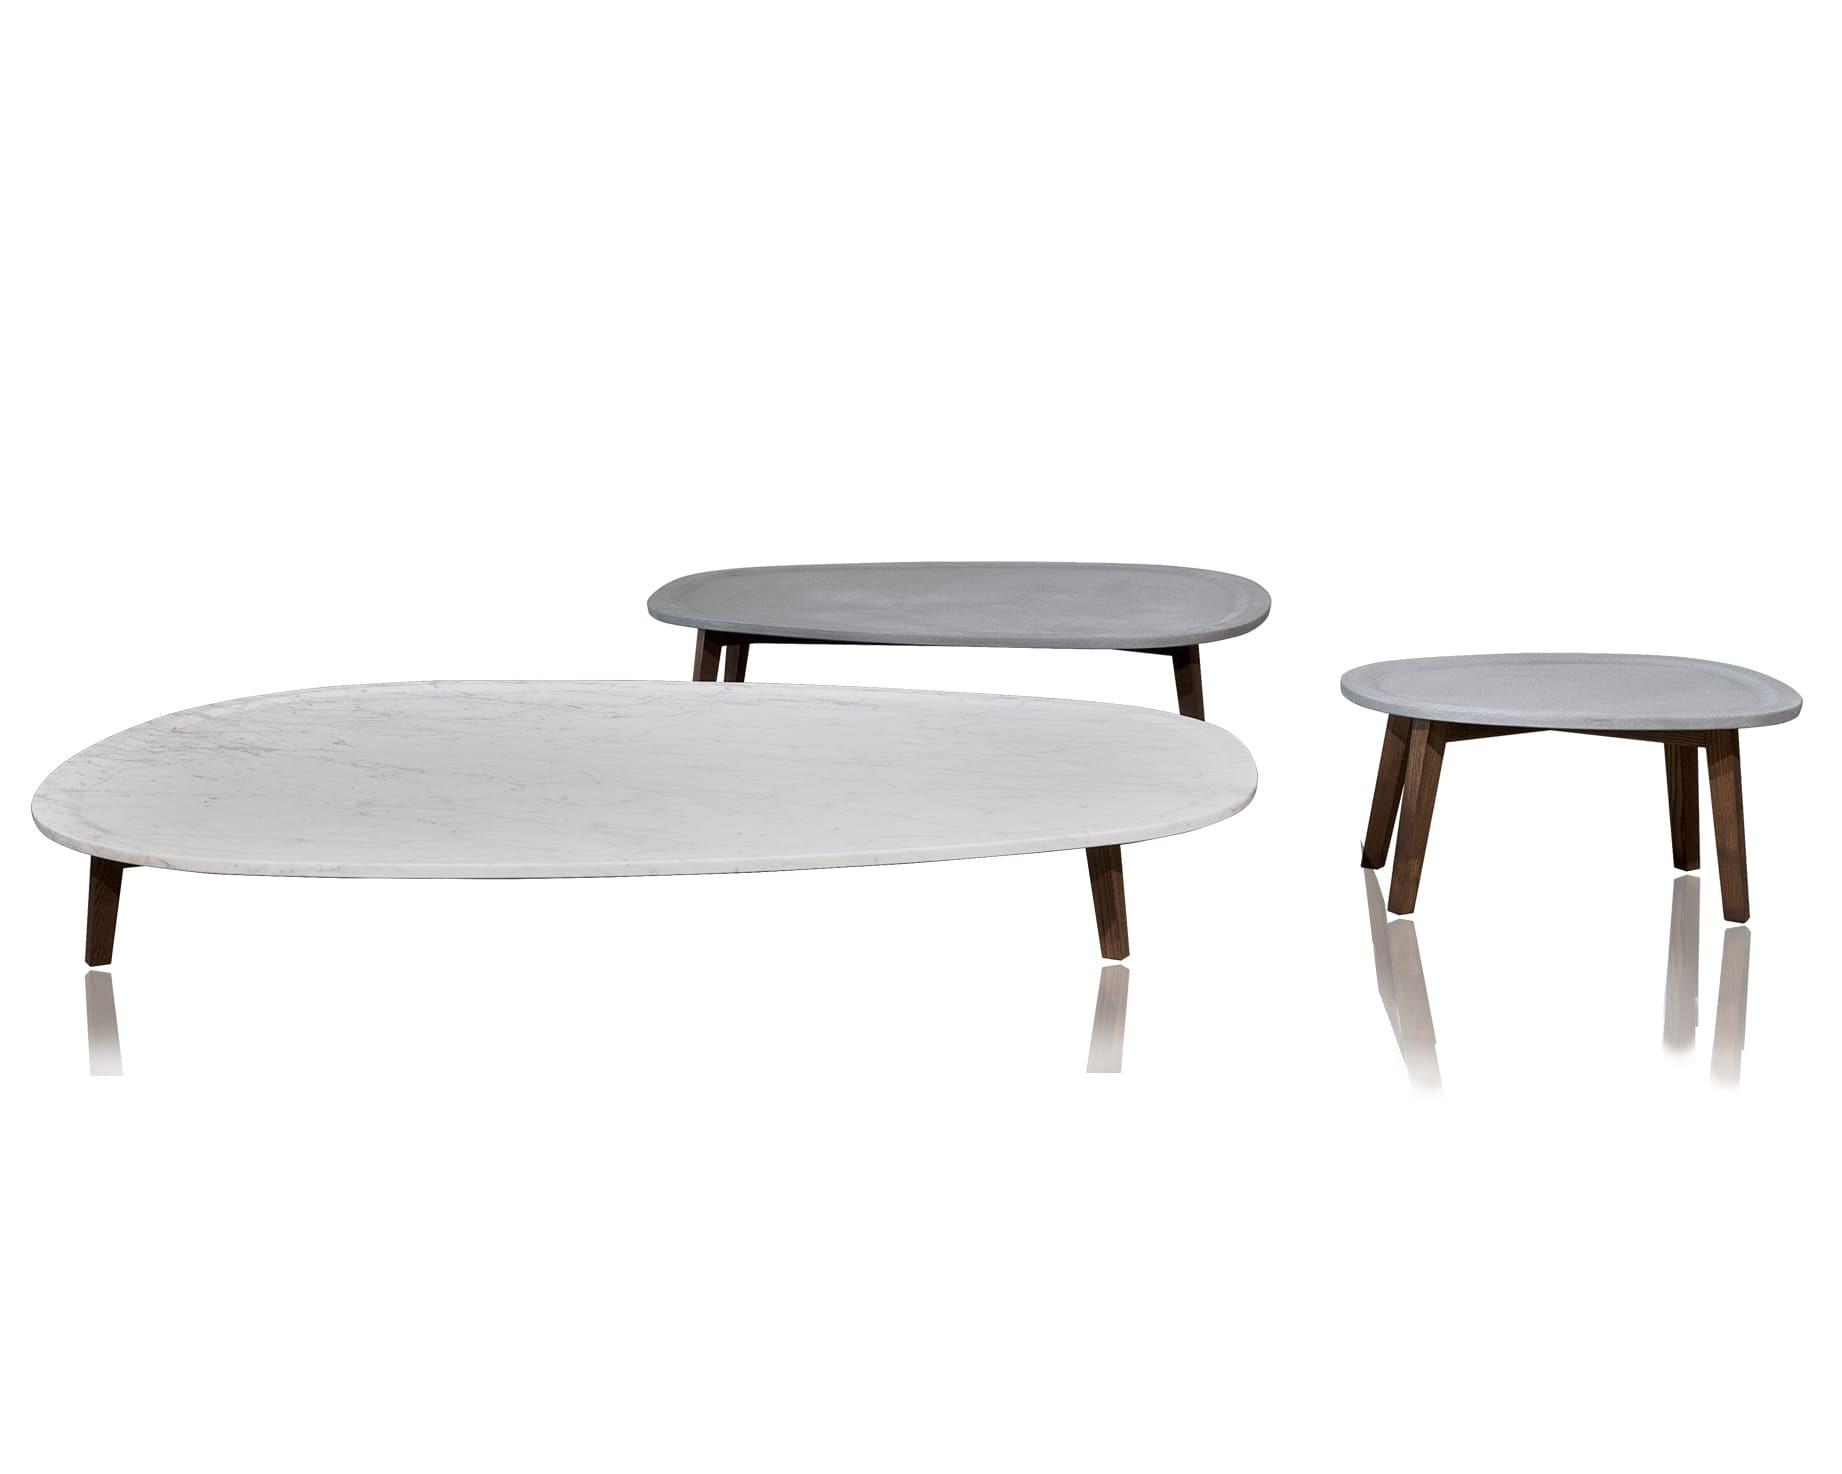 Vietri Table